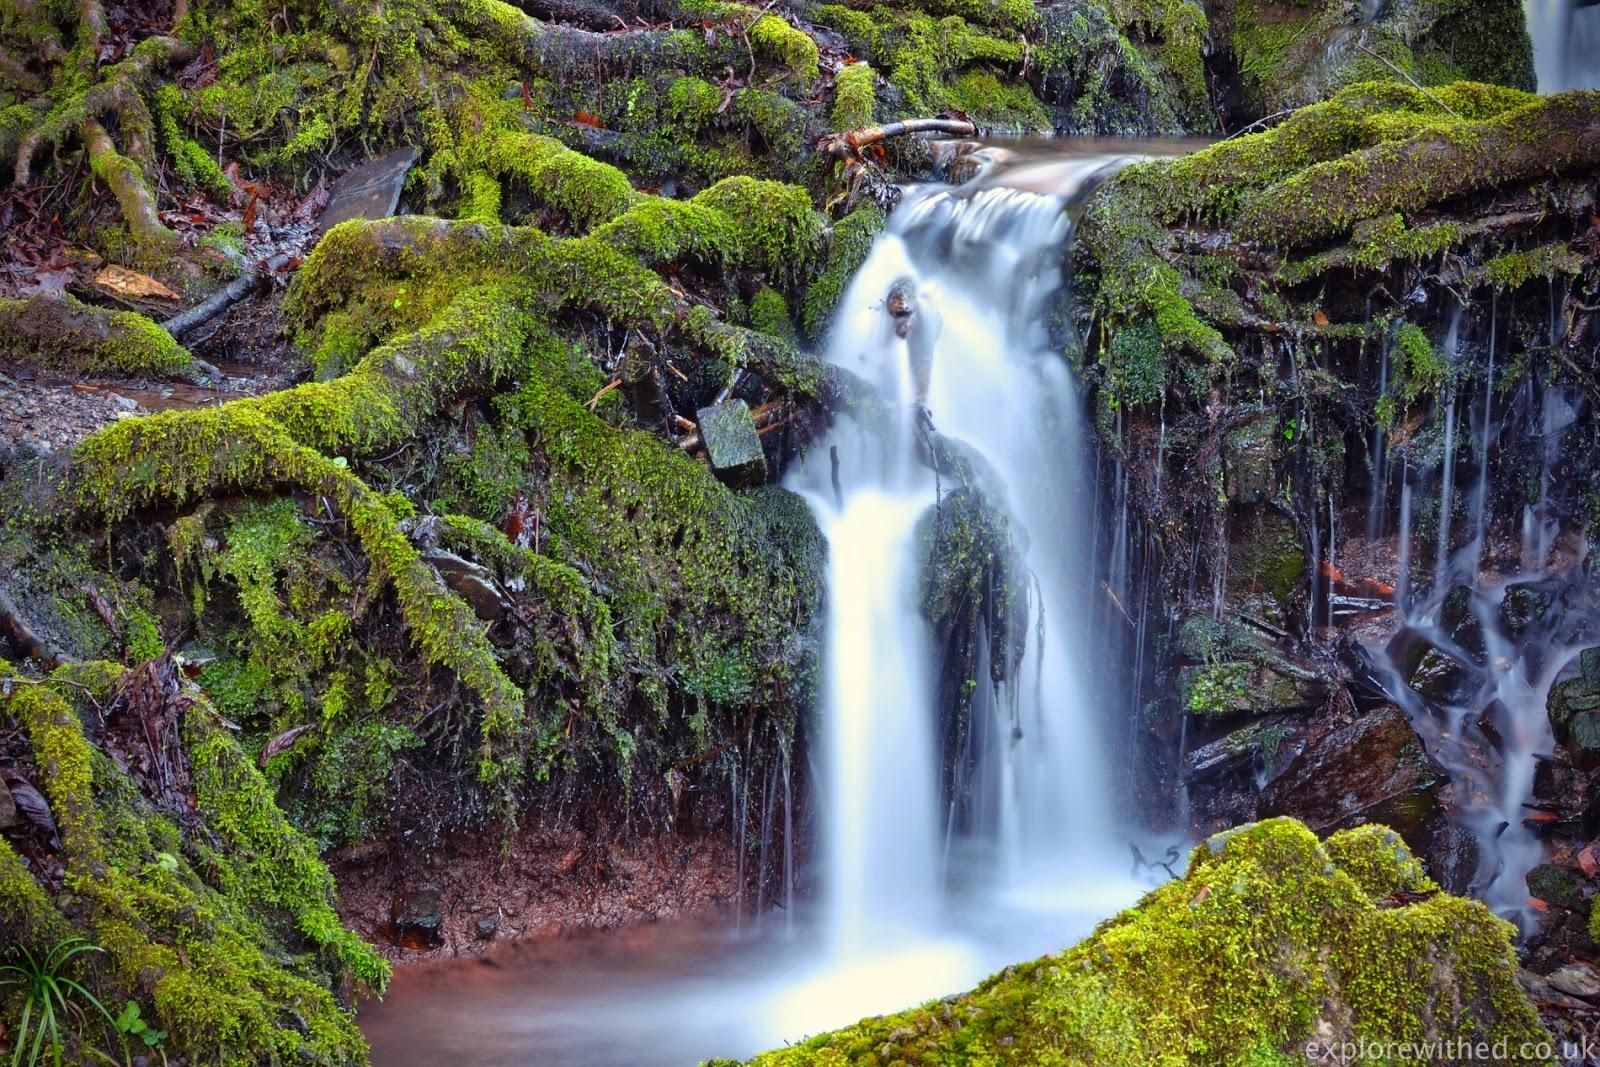 Long exposure shot of a stream